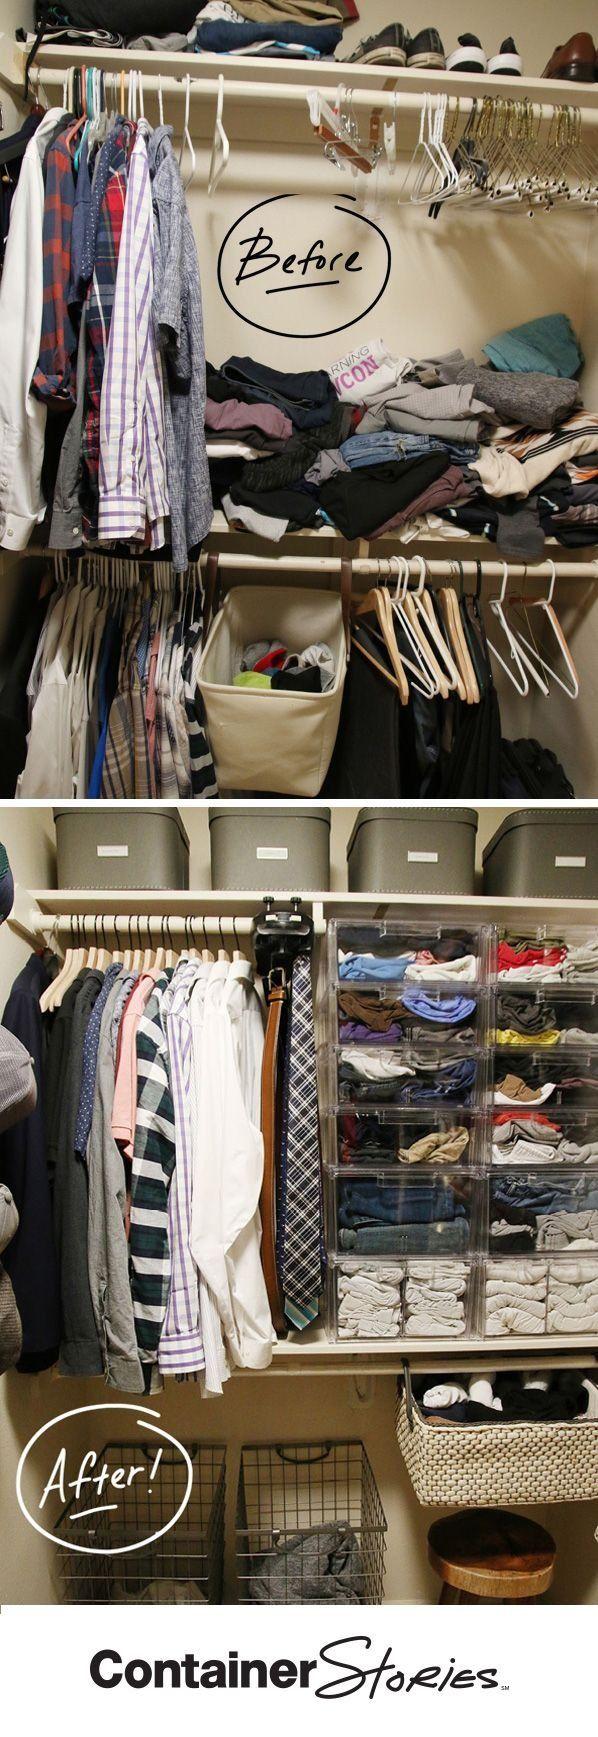 25 best ideas about tie rack on pinterest tie storage for Motorized tie racks for closets